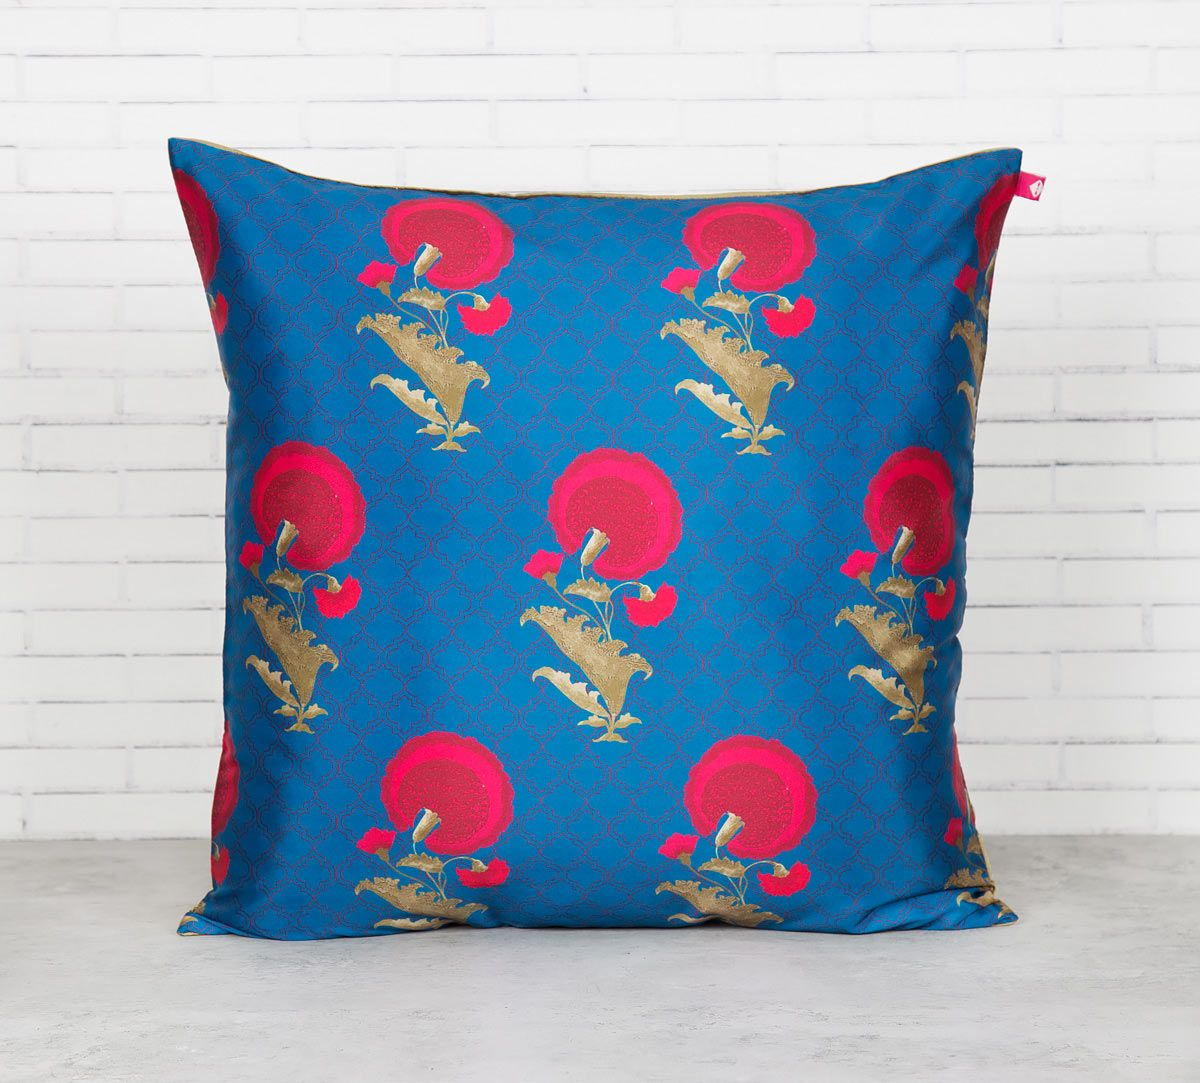 India Circus Yale Flower Regalia Blended Taf Silk Cushion Cover